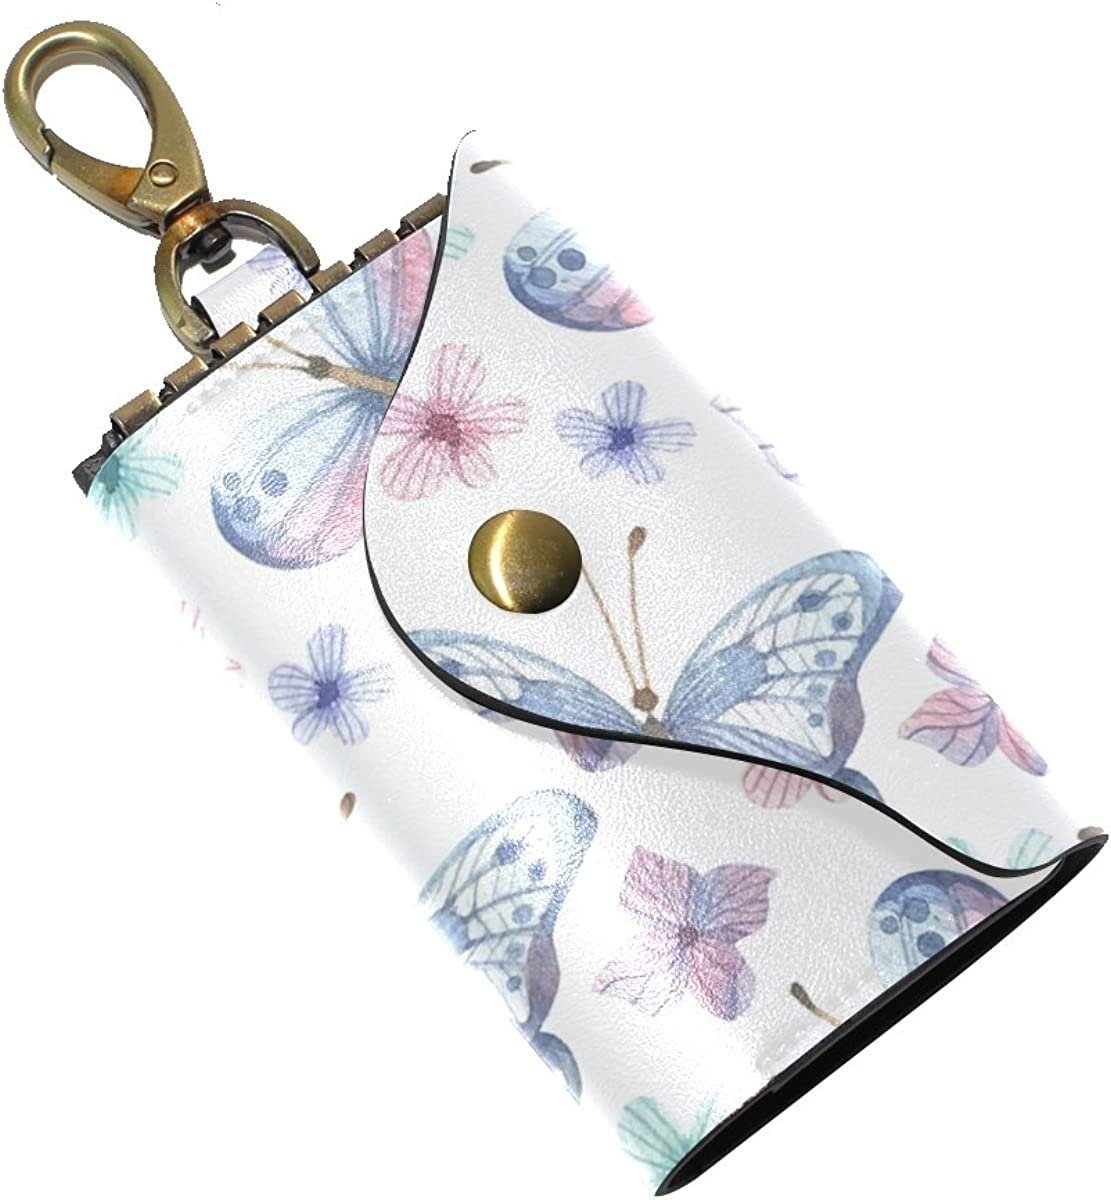 DEYYA Fresh Flowers Butterfly Leather Key Case Wallets Unisex Keychain Key Holder with 6 Hooks Snap Closure